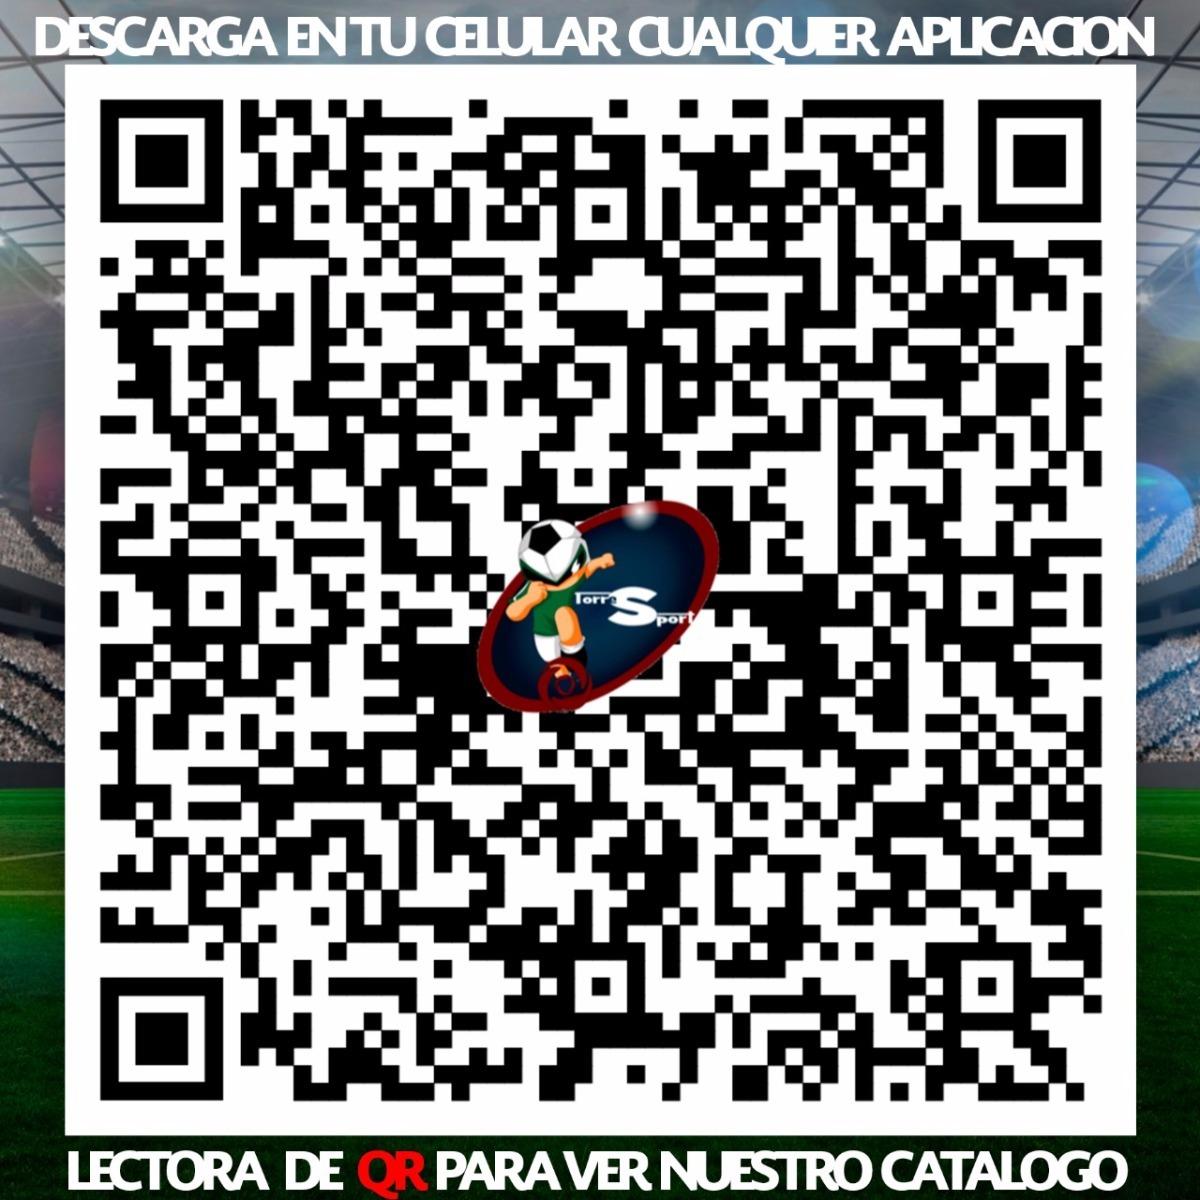 Uniformes De Futbol Originales Marca Nike Clubes 2017 -   499.00 en ... 555118e65c0db